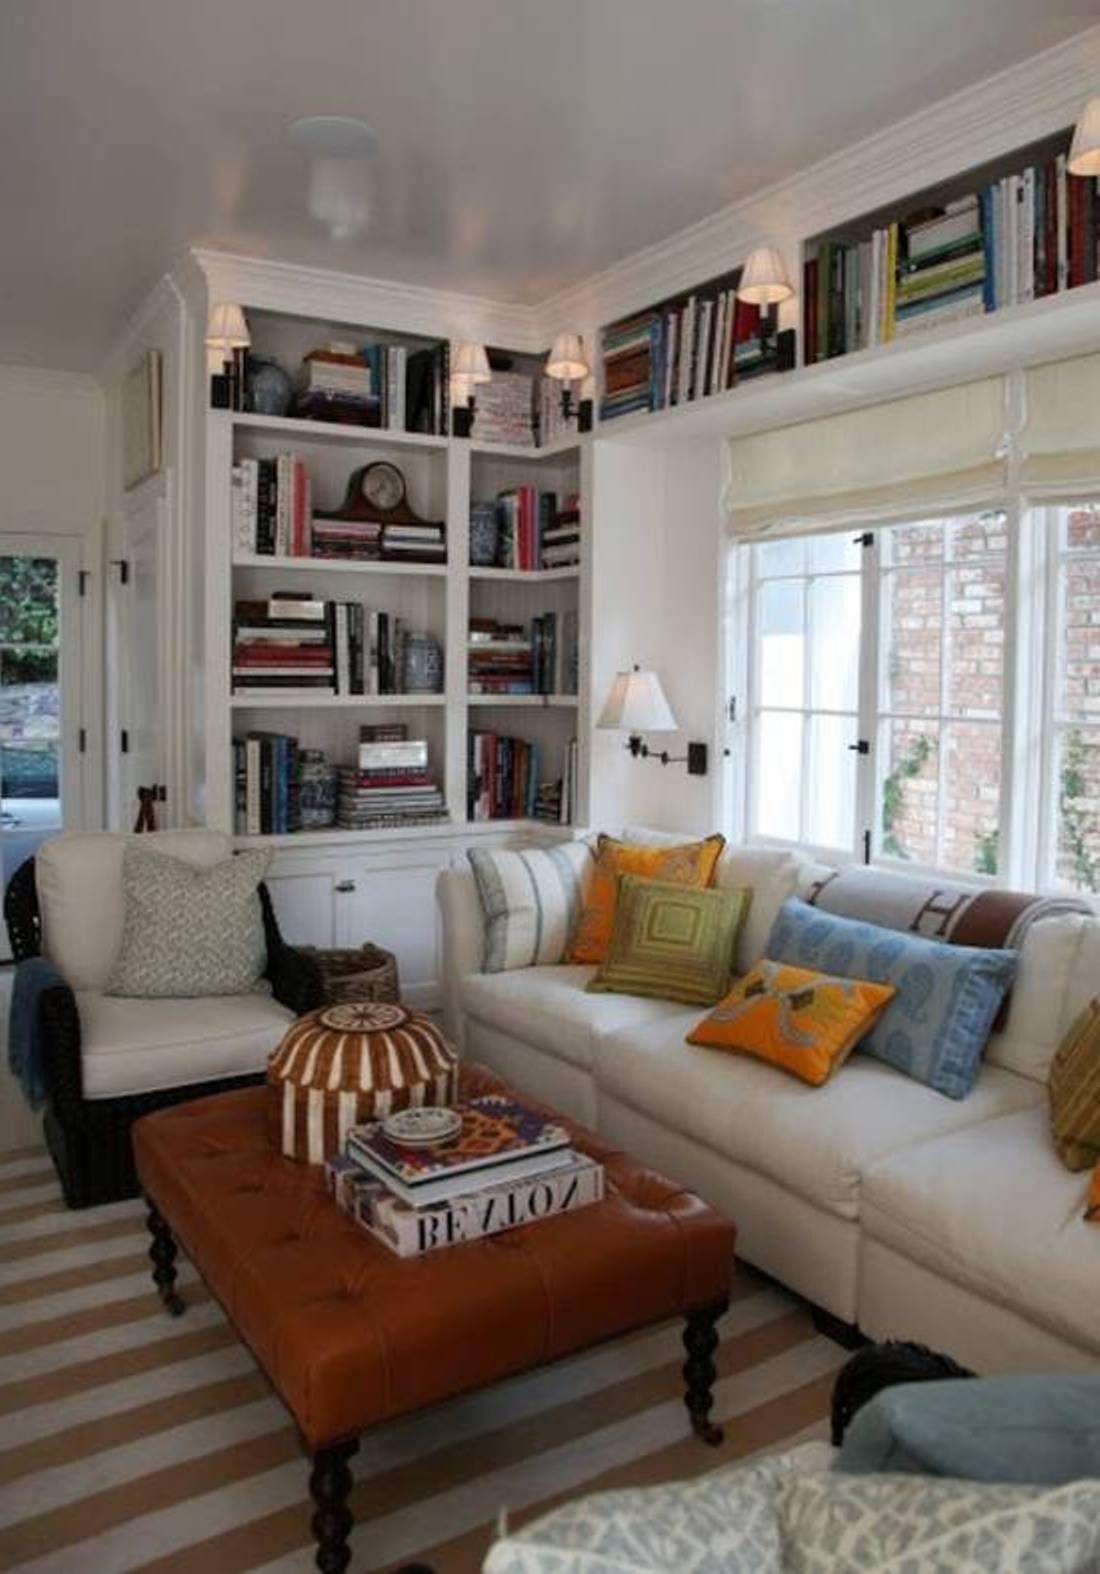 Reading Area Decorating Ideas Living Room Jpg 1 100 1 574 Pixels Small Living Rooms Pinterest Living Room Kid Friendly Living Room